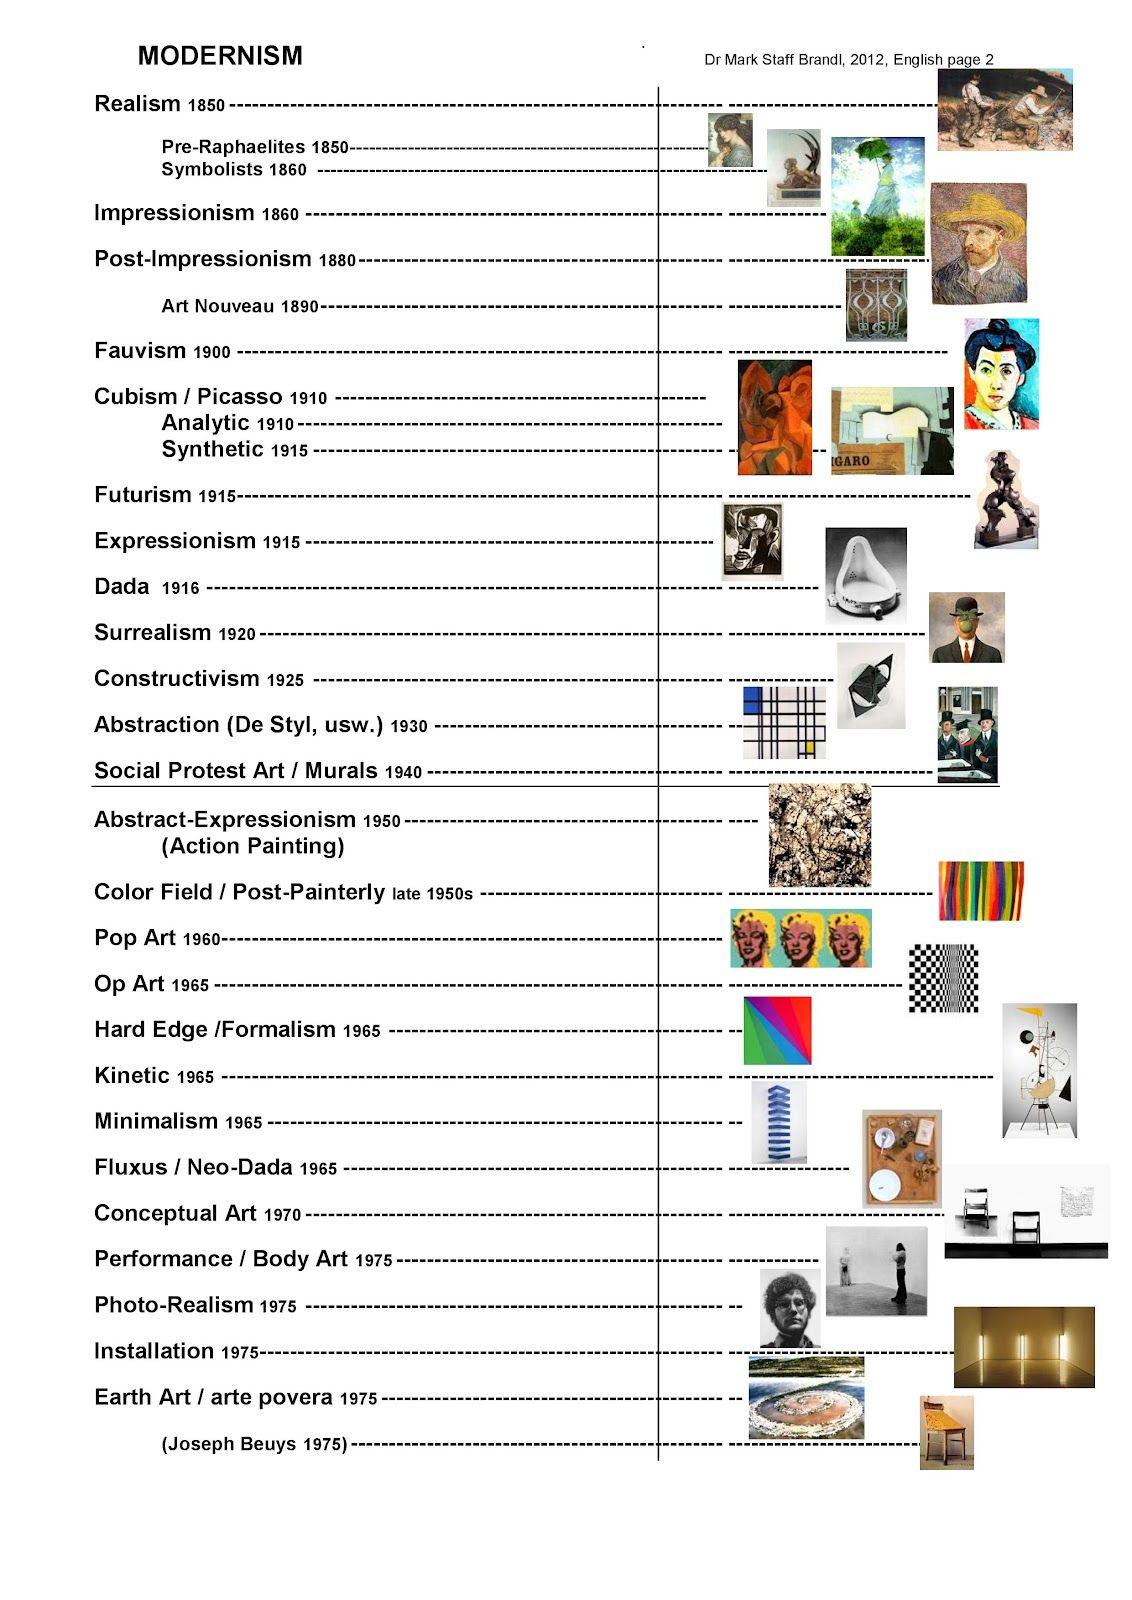 Brandl Art History Timeline New 12 Page 002 1 132